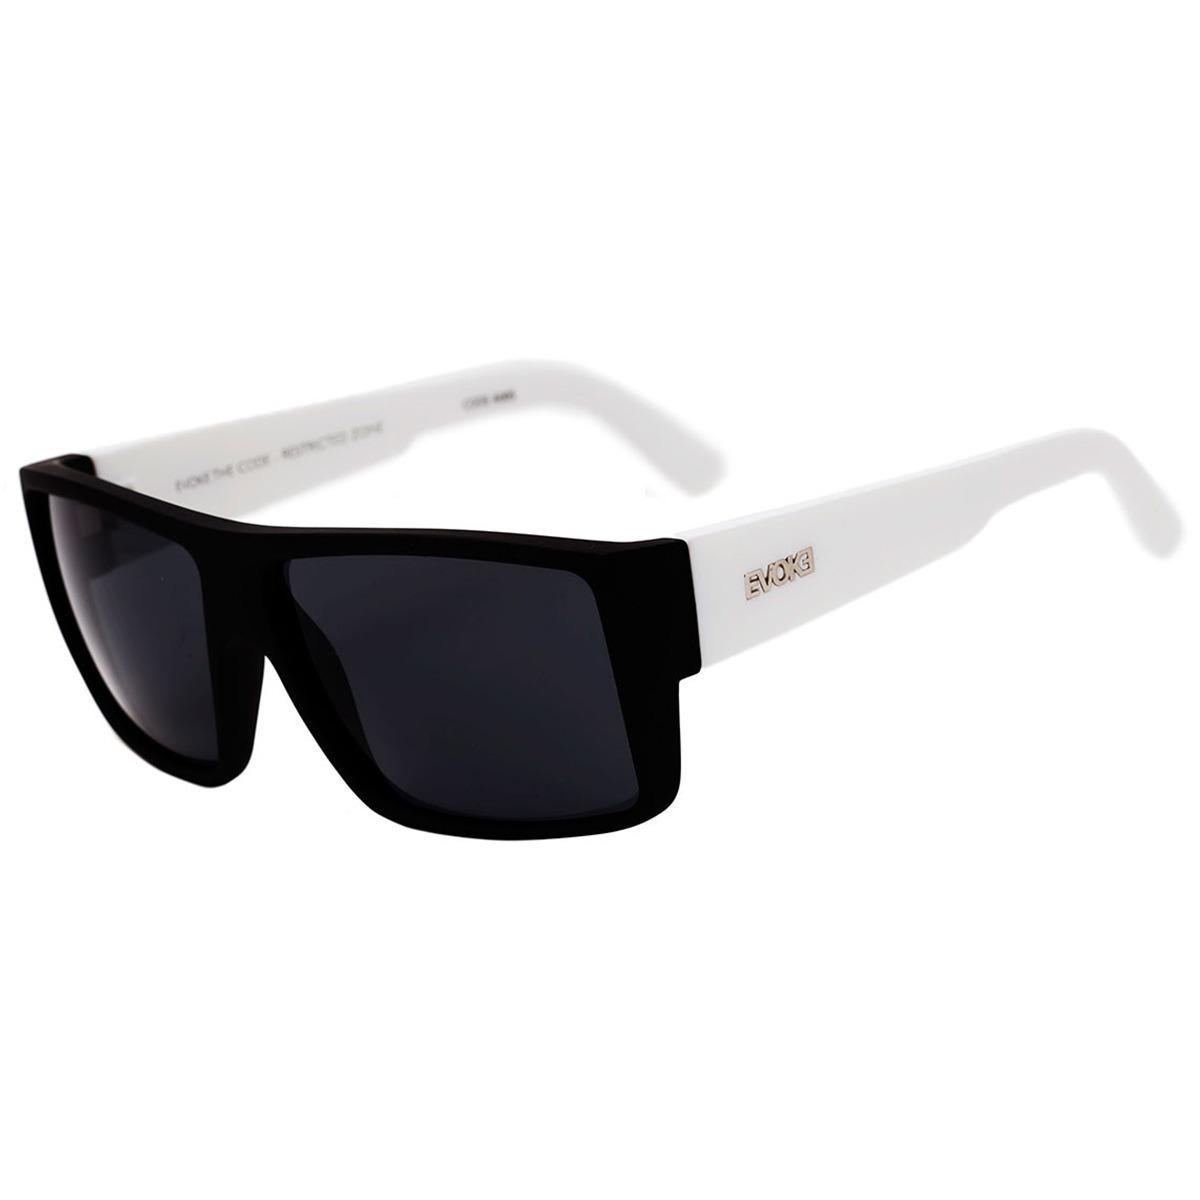 b59665049ac5b oculos sol evoke the code preto fosco temple branco original. Carregando  zoom.